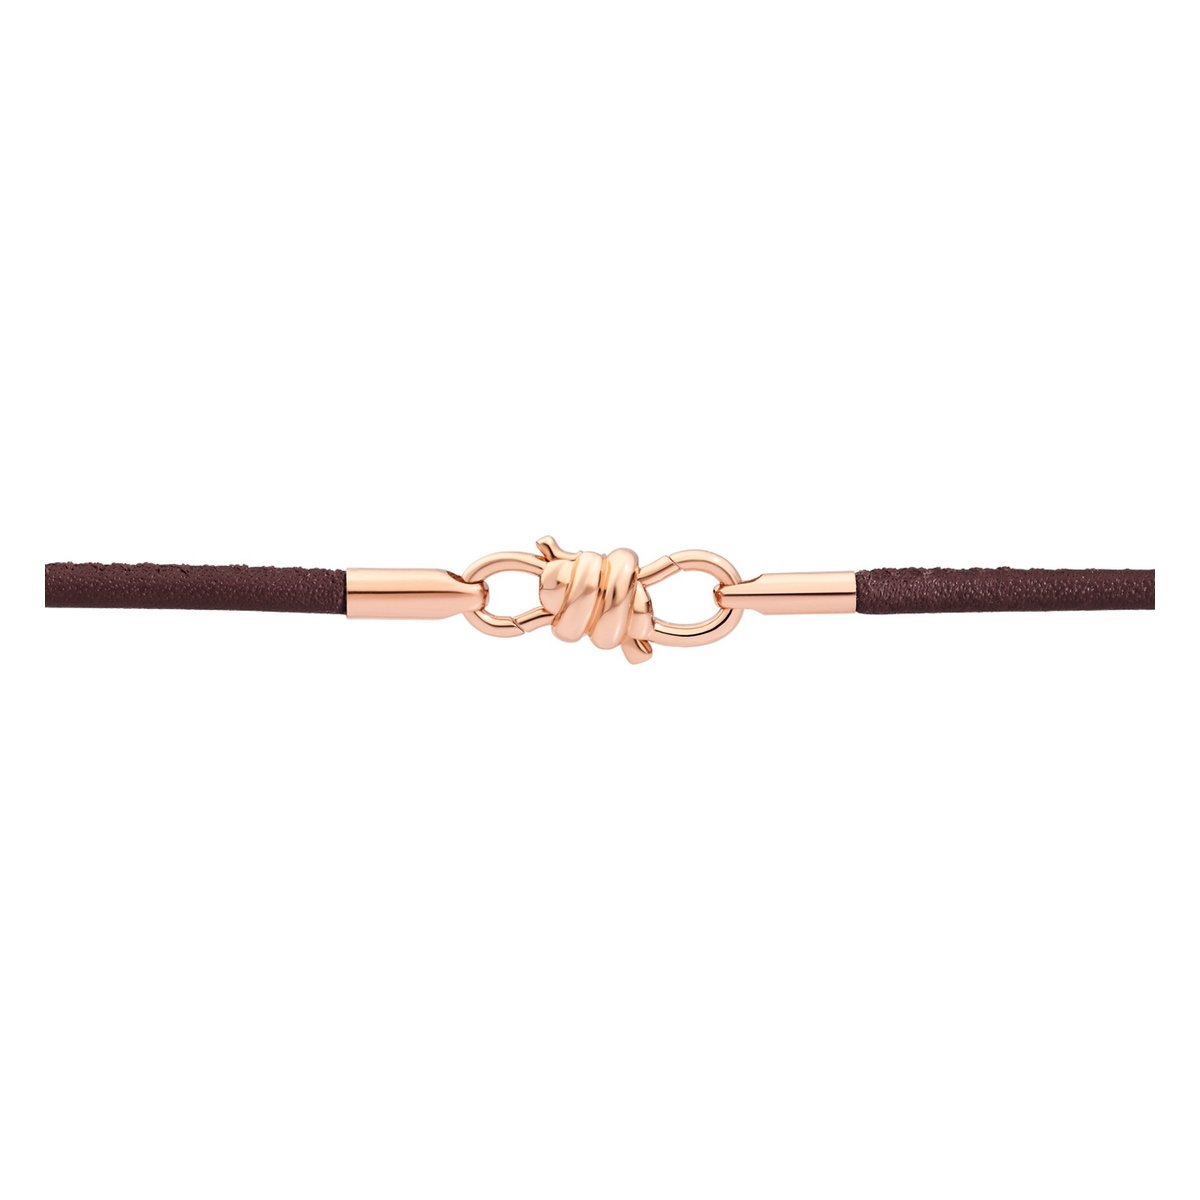 Bracelet sur cordon DoDo Nodo Bracelet Nodo en or rose et cuir moka, 17cm vue 2